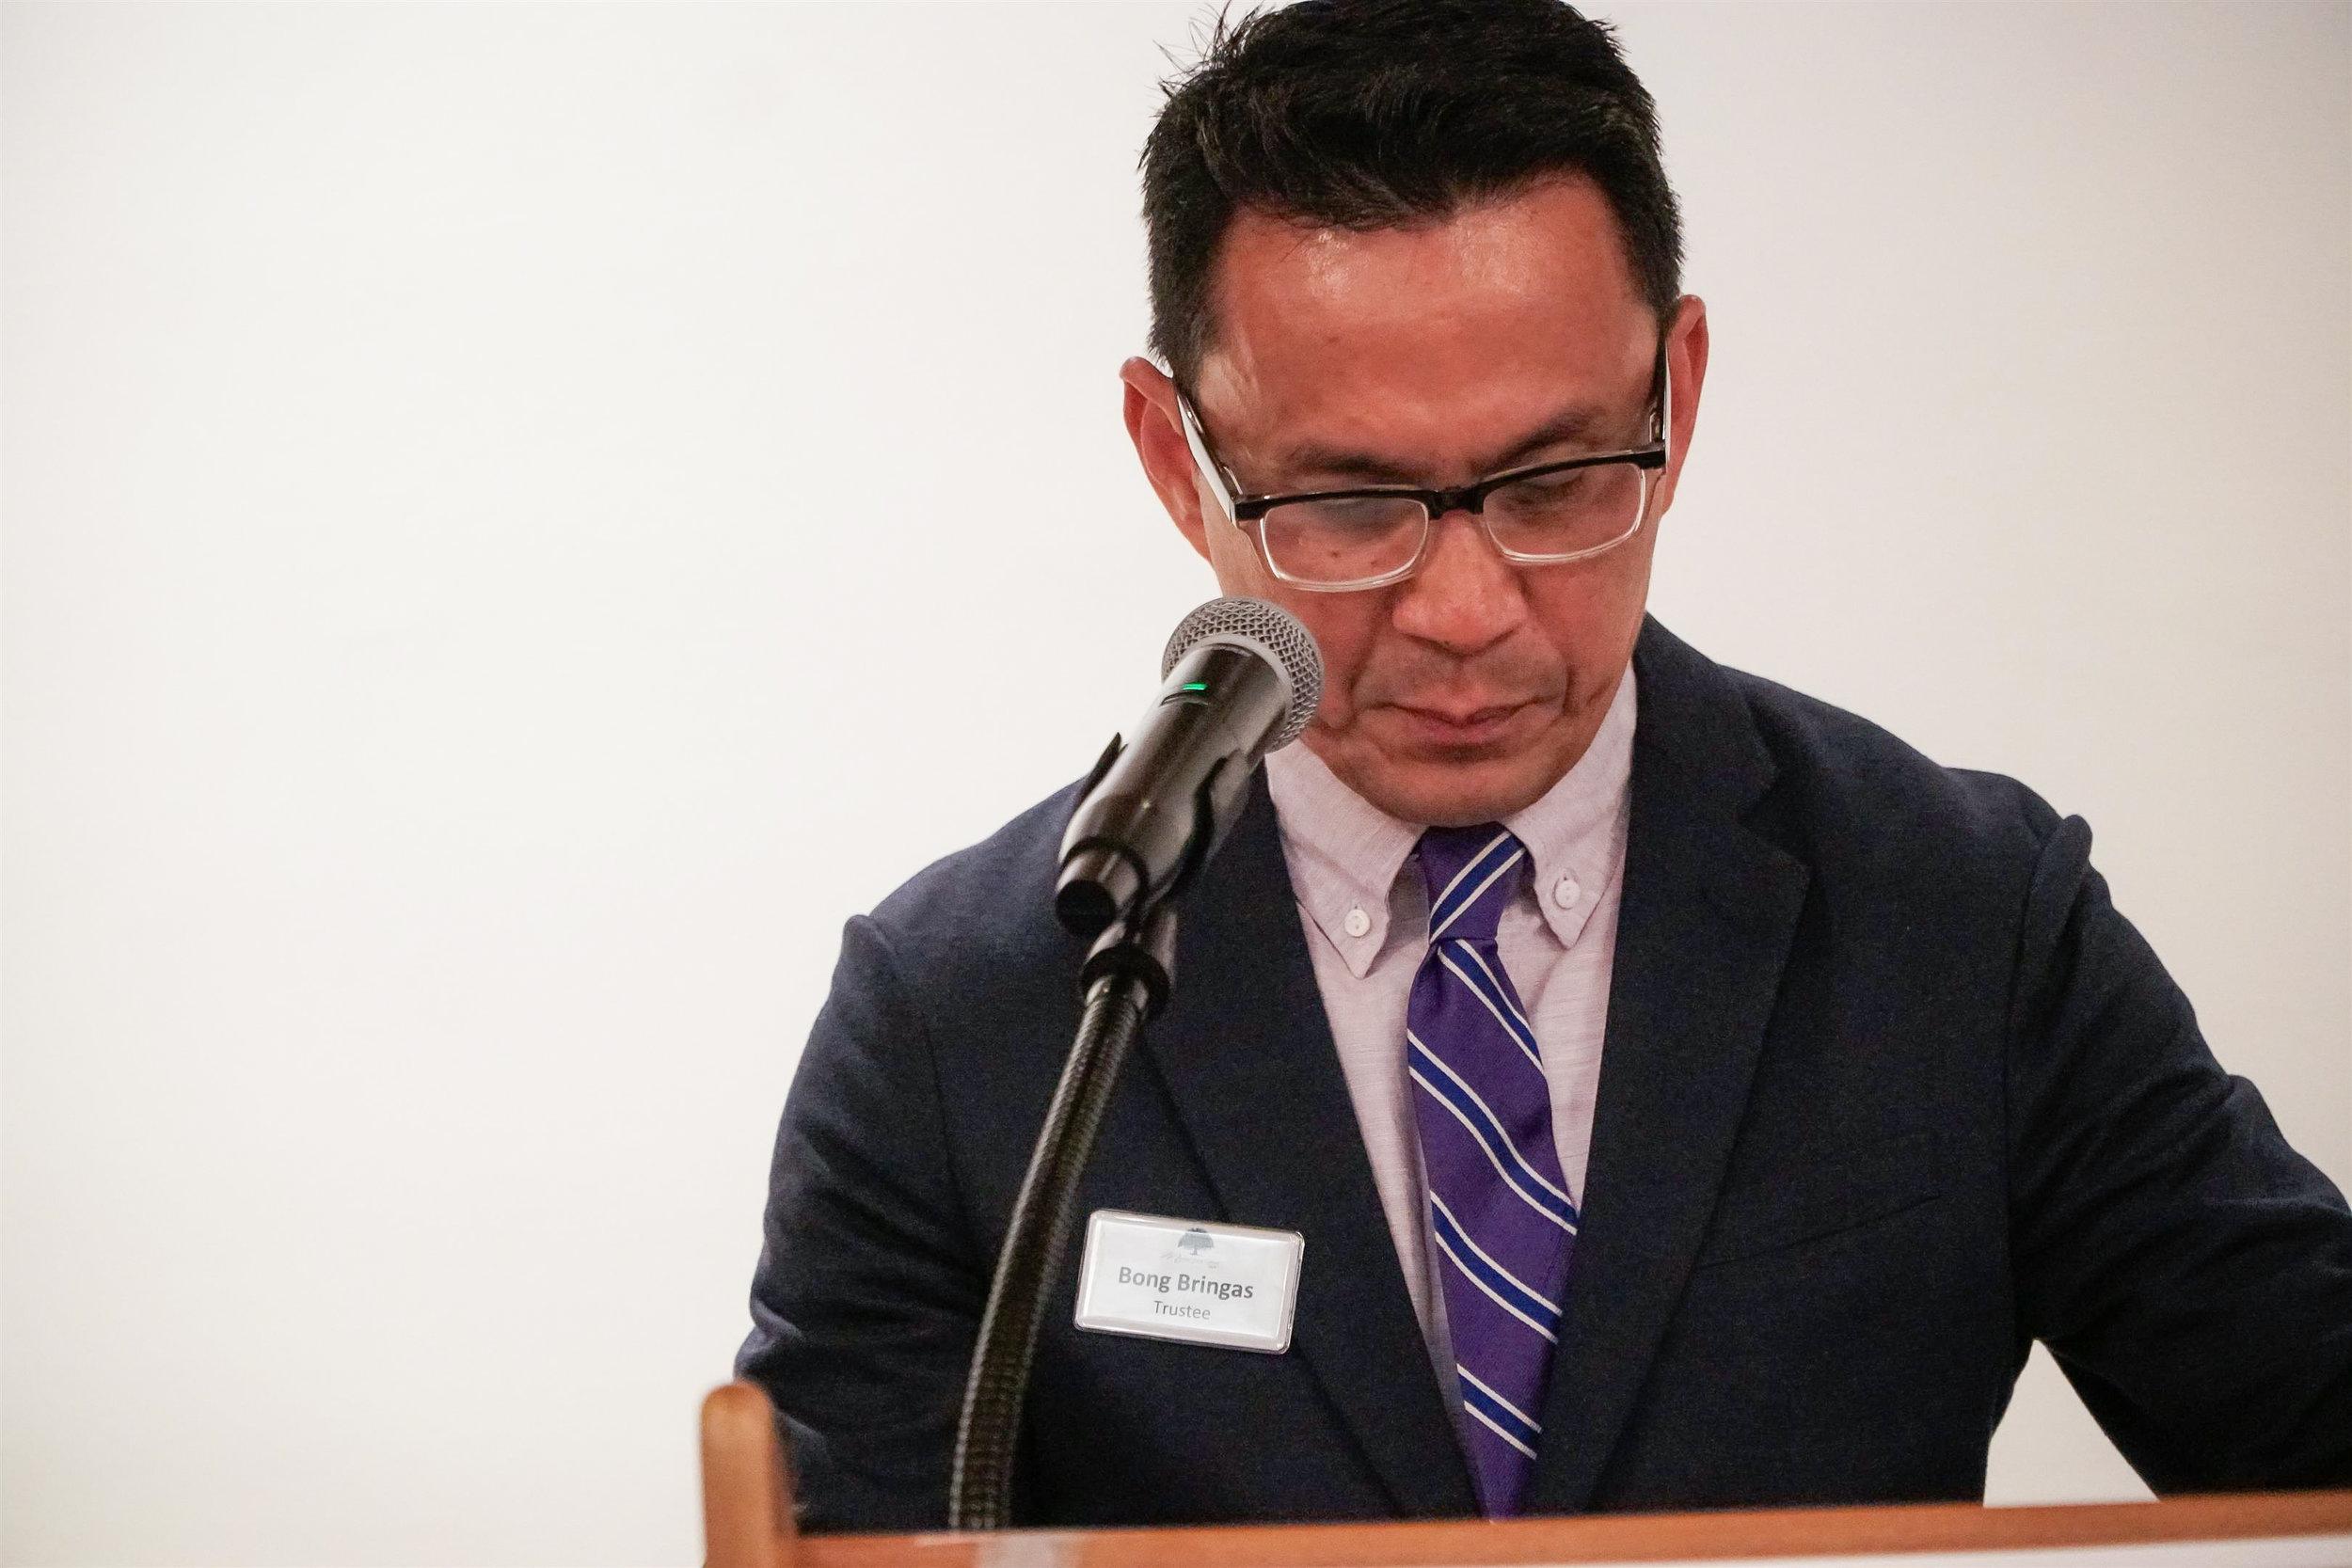 Bong Bringas, MVGH trustee